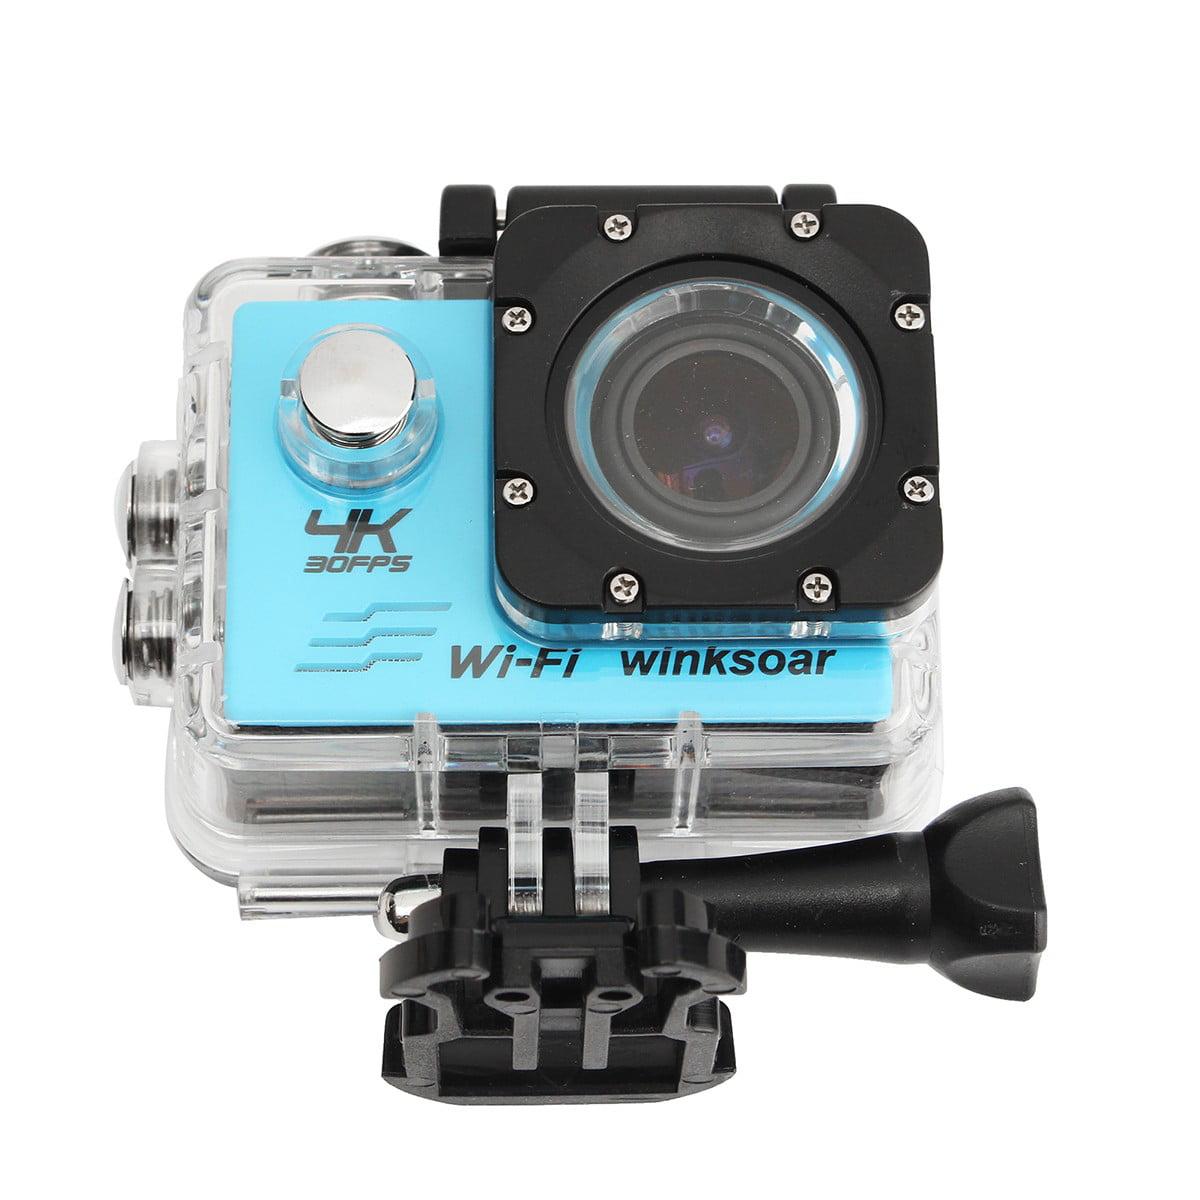 Winksoar Waterproof SJ8000 4K HD WiFi 2.0 LCD 170° Sports Action Camera DV Photography Birthday Christmas Gift